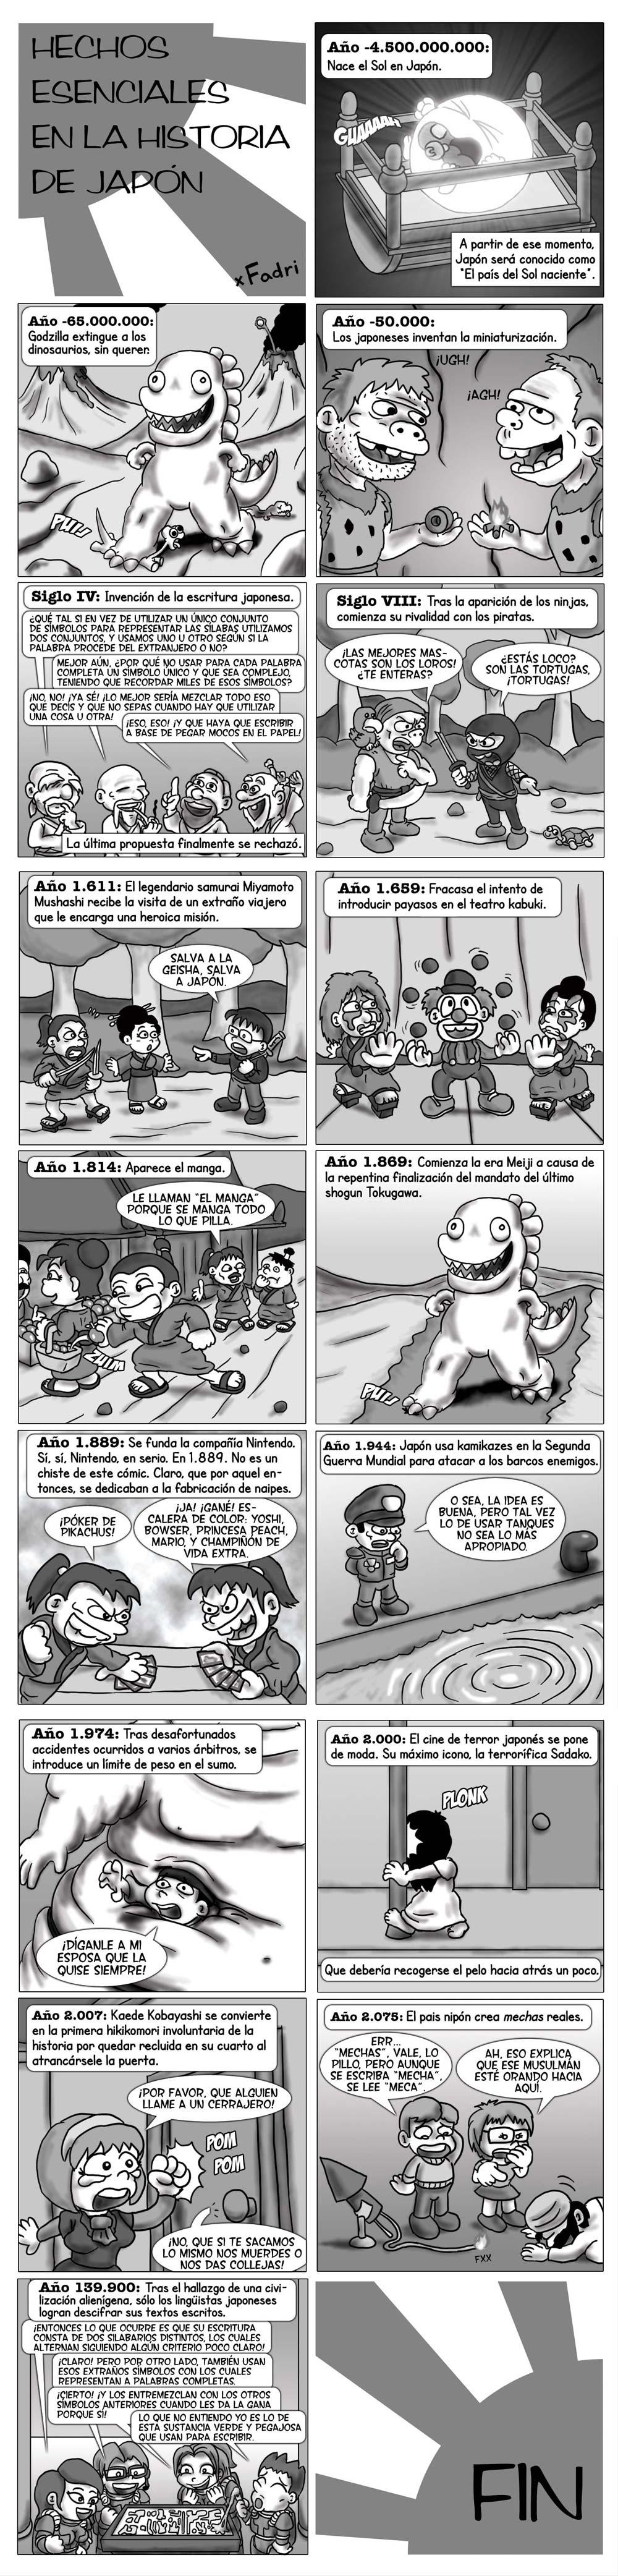 Historia_de_Japon_comic